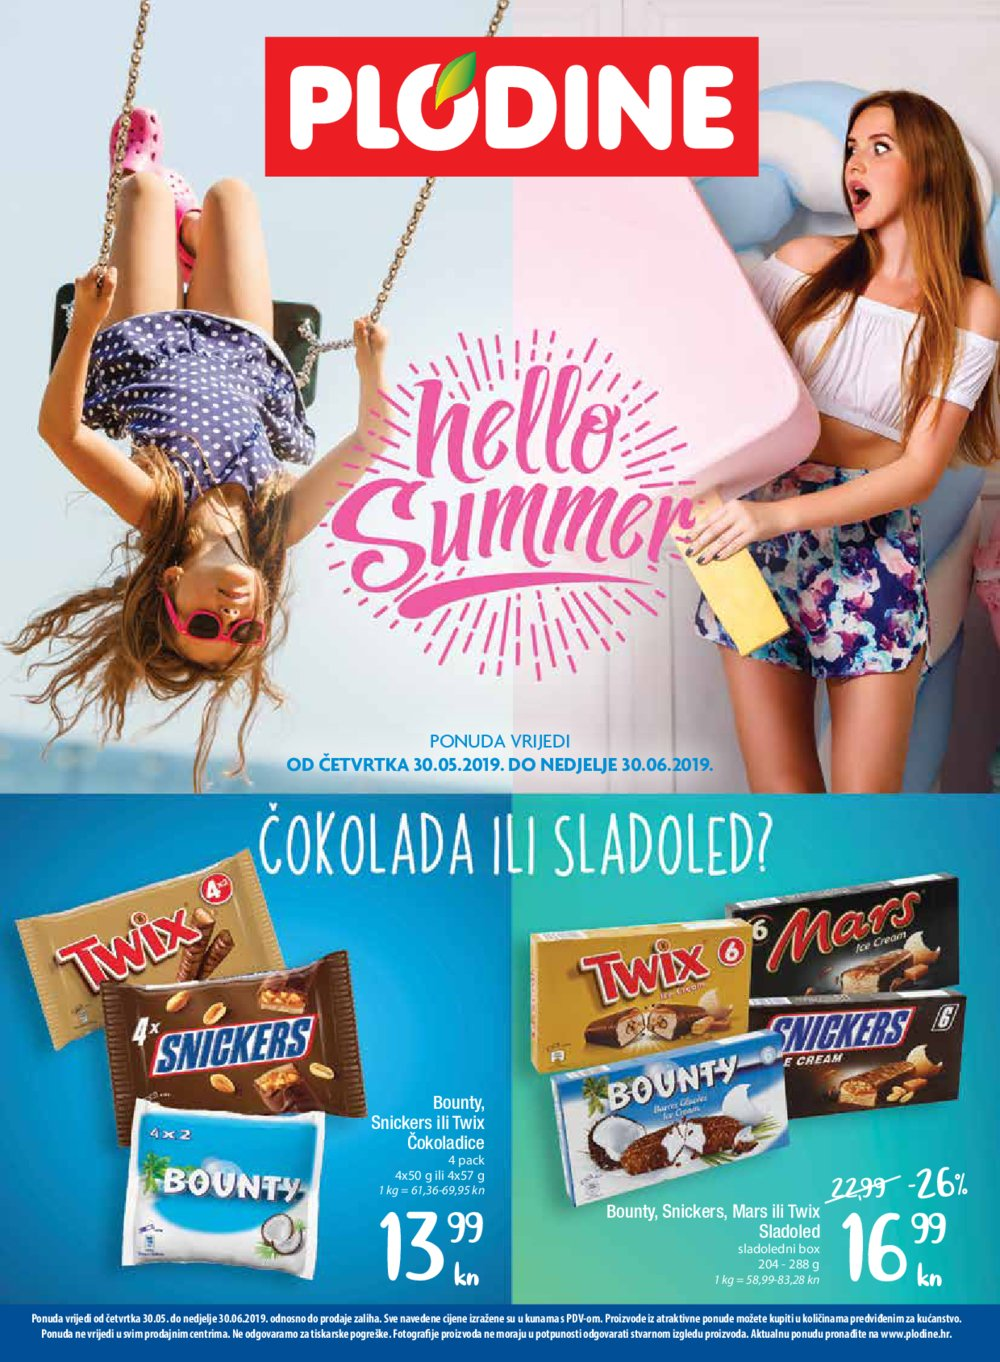 Plodine Hello Summer Akcija 30.05.-30.06.2019.